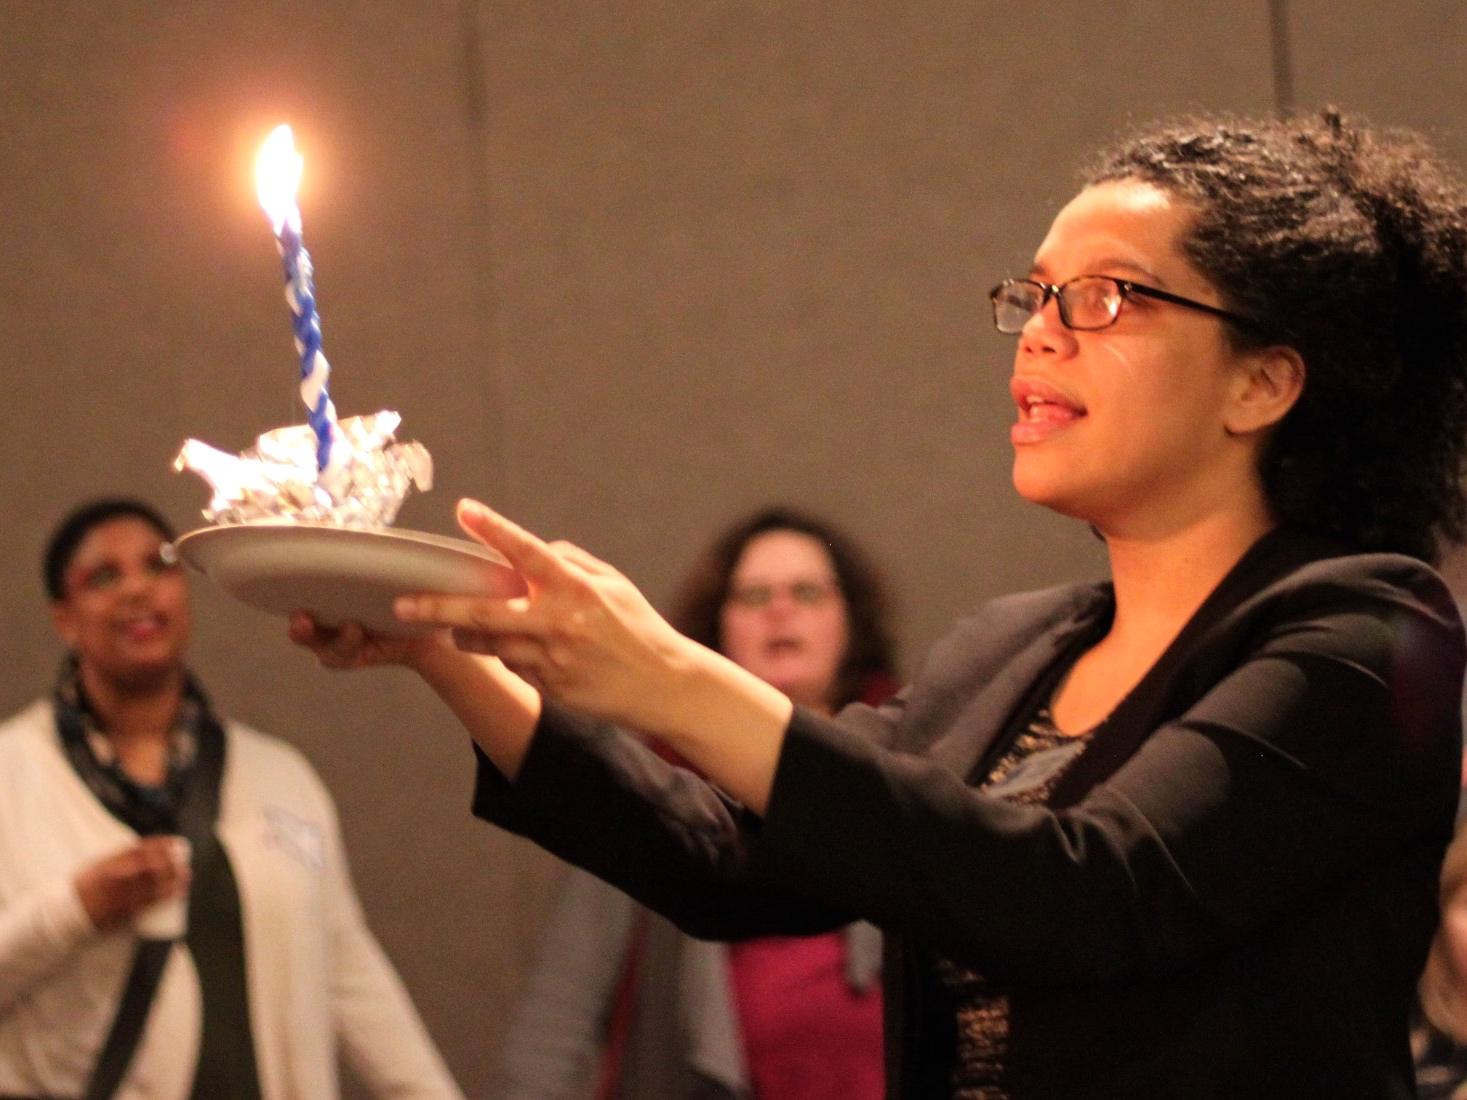 April holding havdallah candle, saying blessing